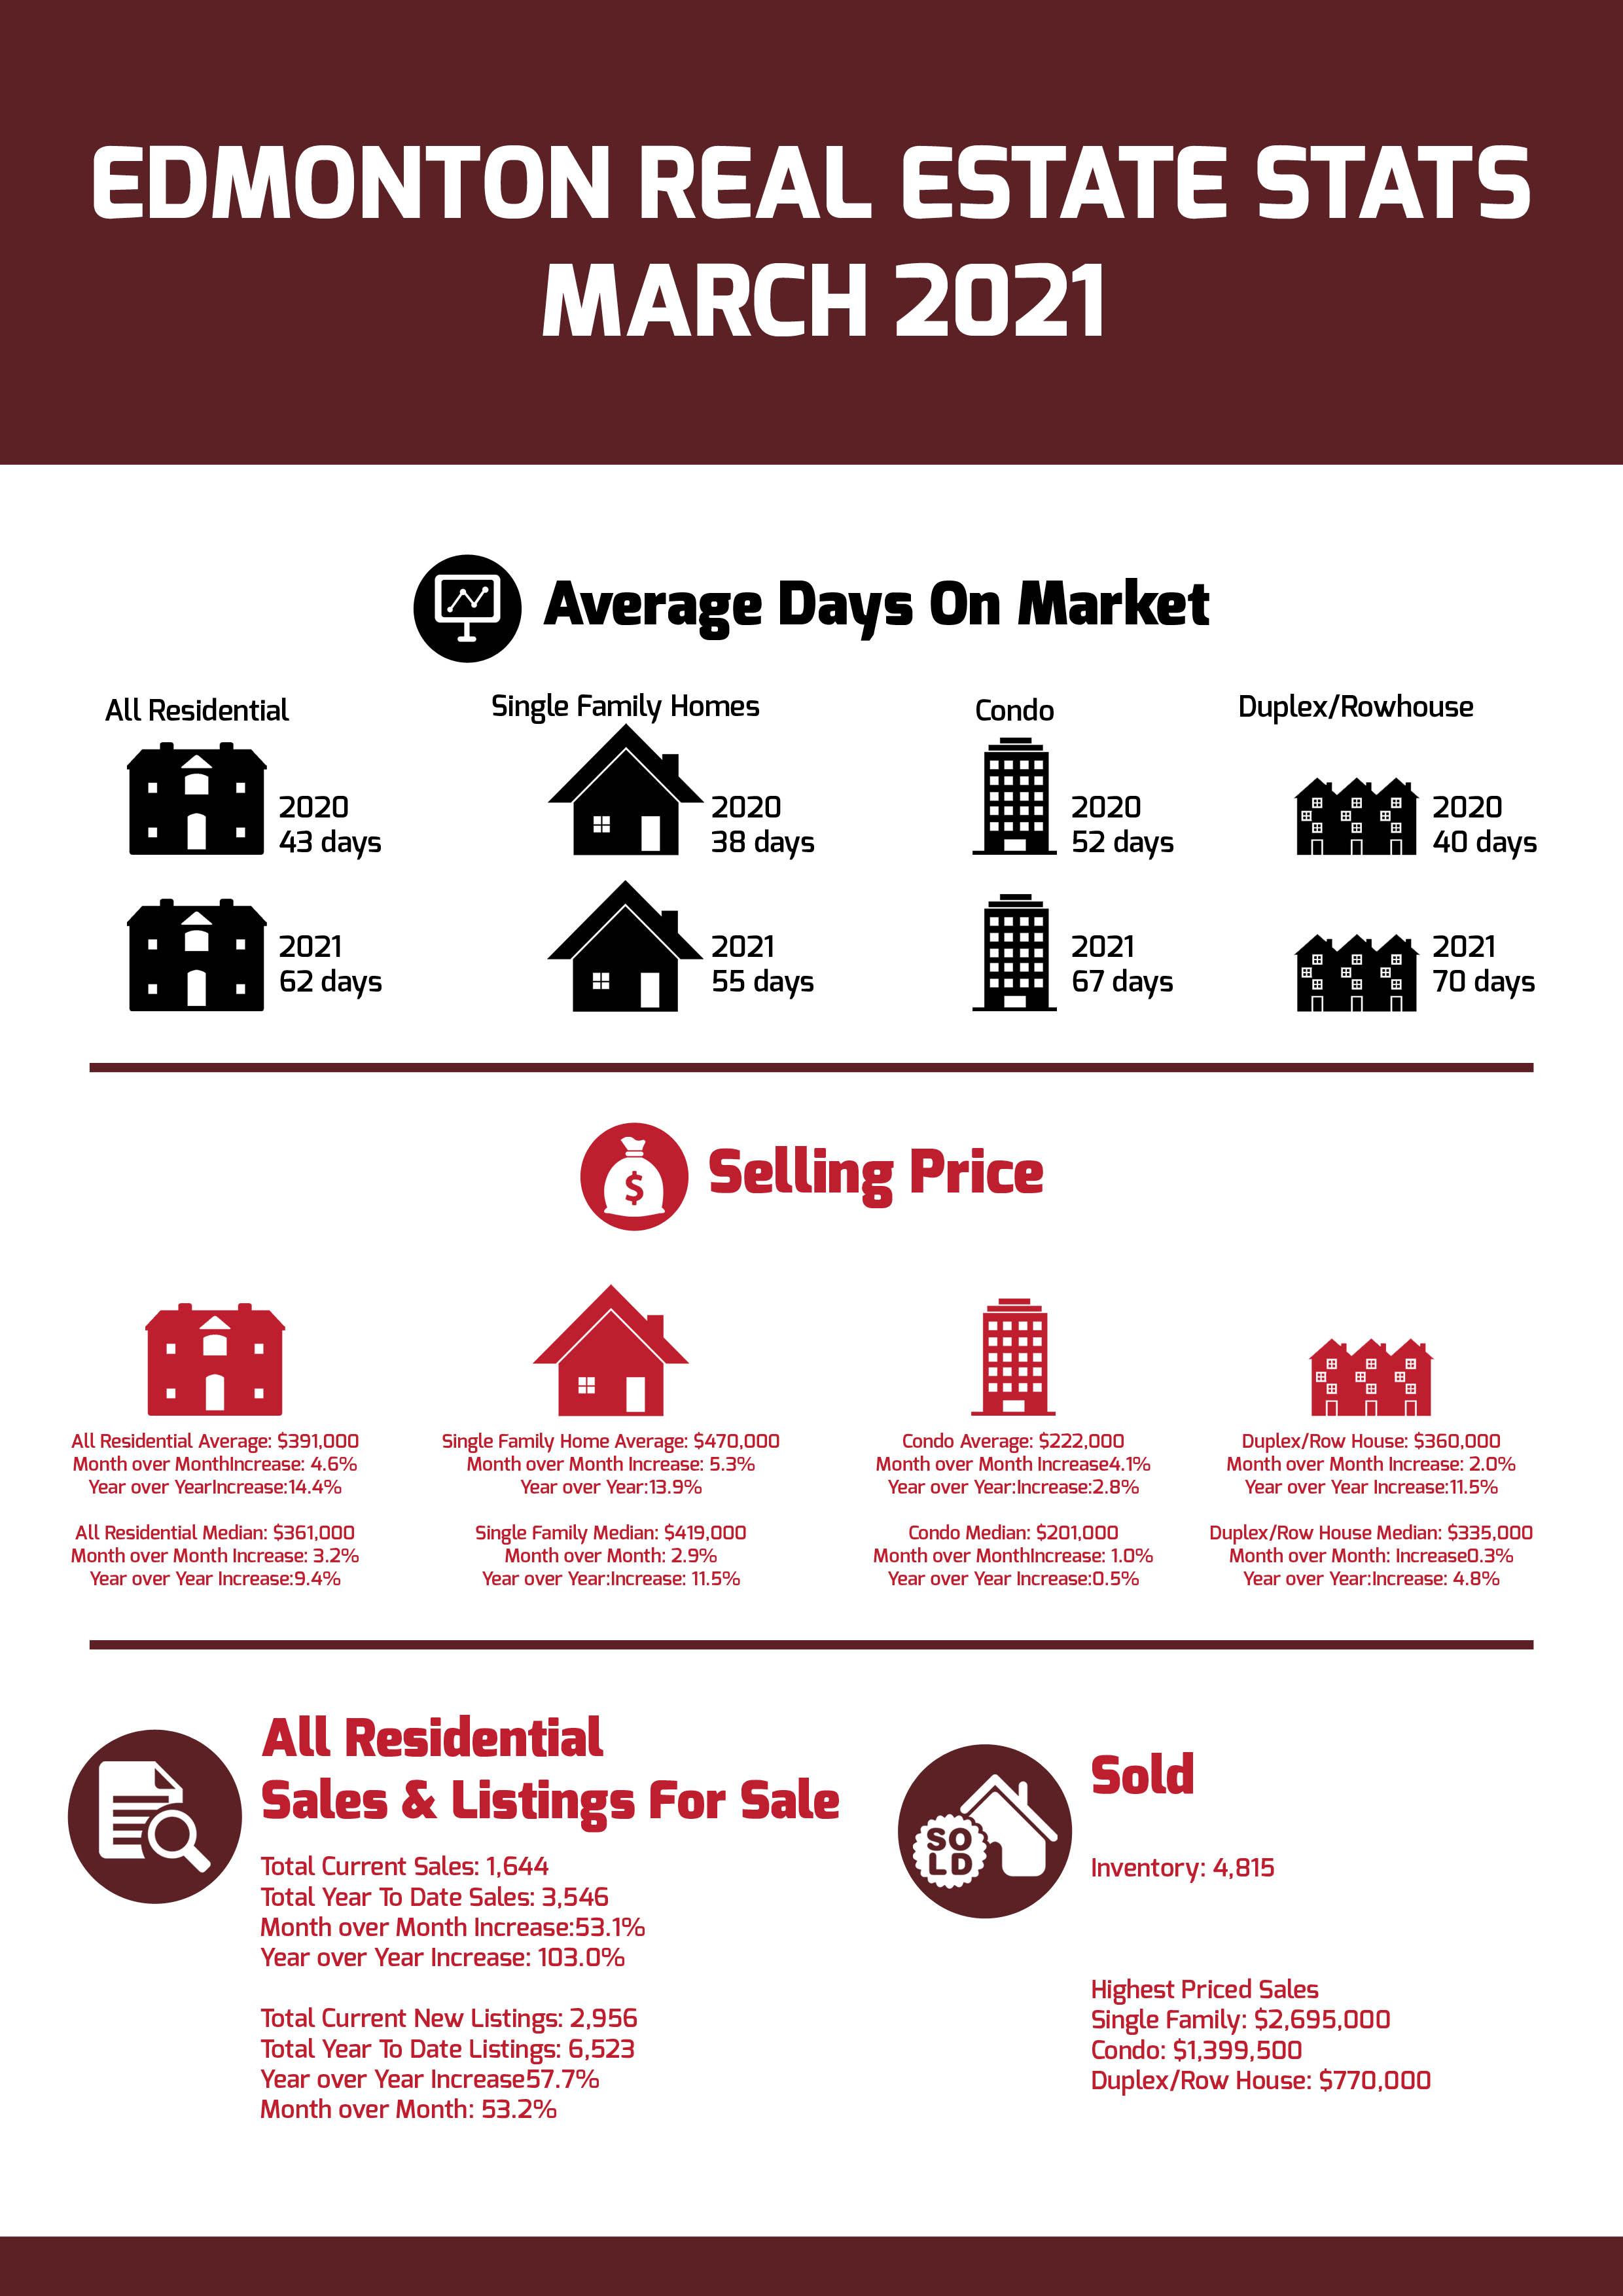 Edmonton Real Estate Stats March 2021